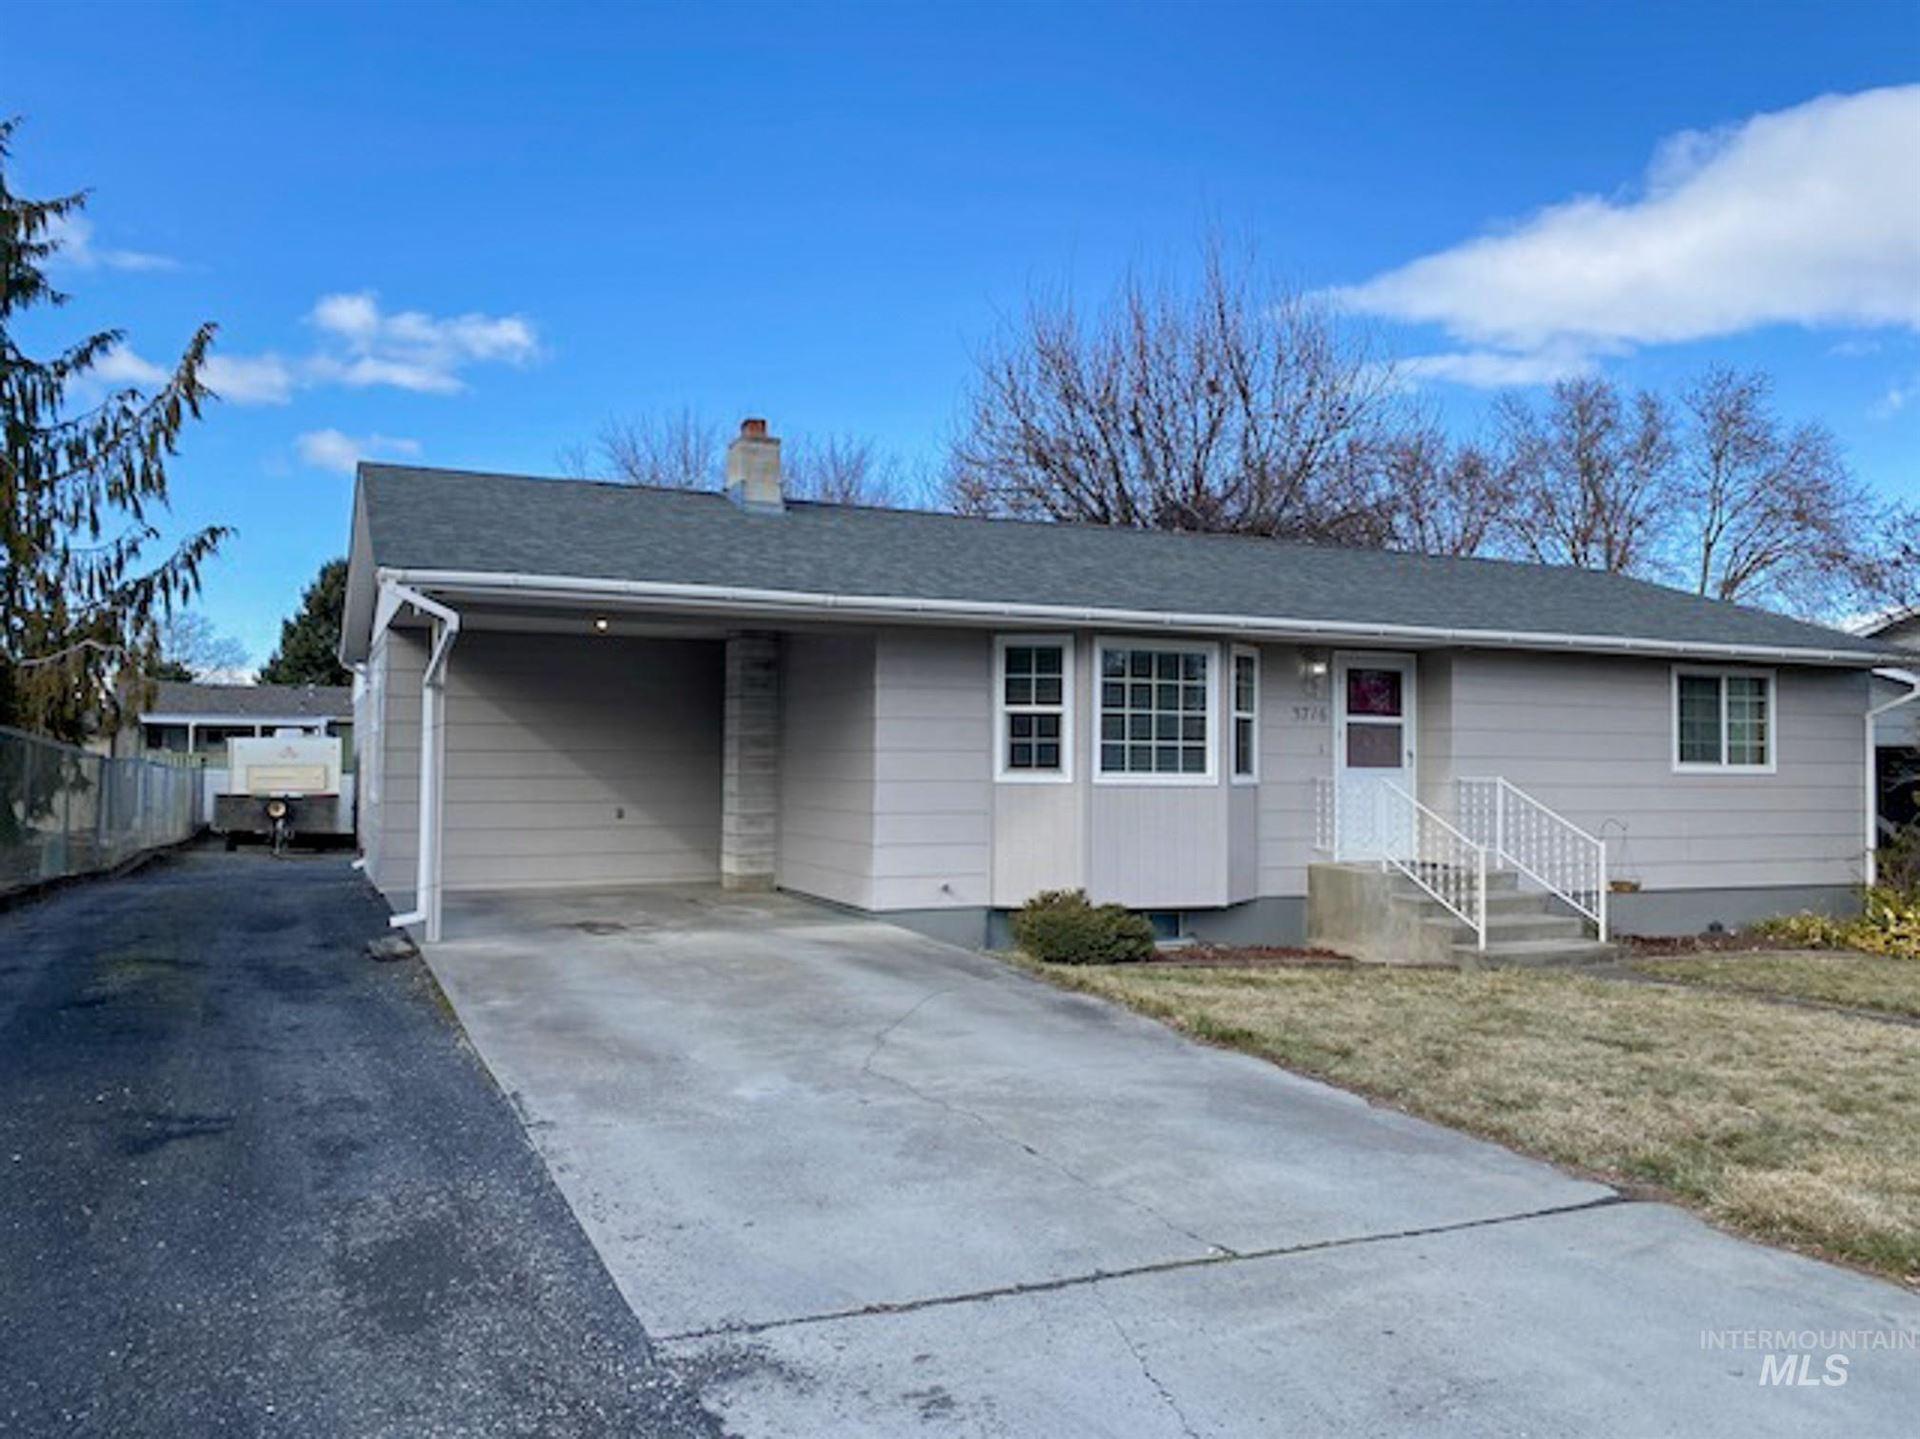 Photo of 3716 14TH ST. E, Lewiston, ID 83501 (MLS # 98794830)